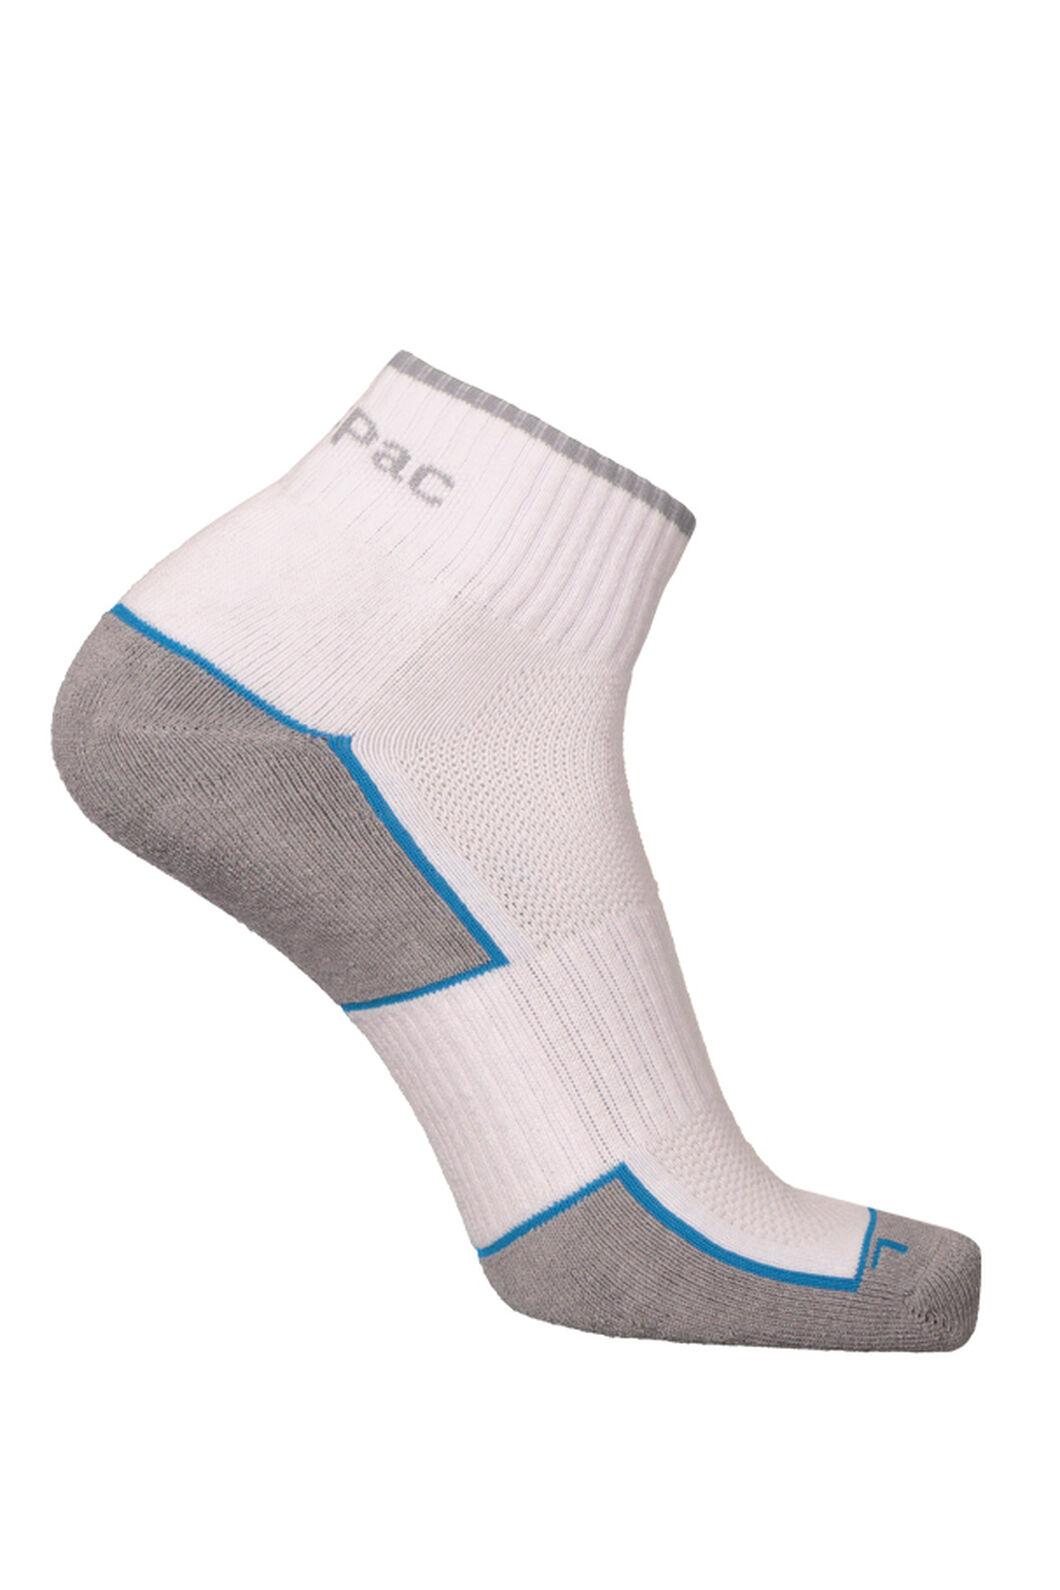 Macpac Cross Trainer Socks (2 Pack), White, hi-res